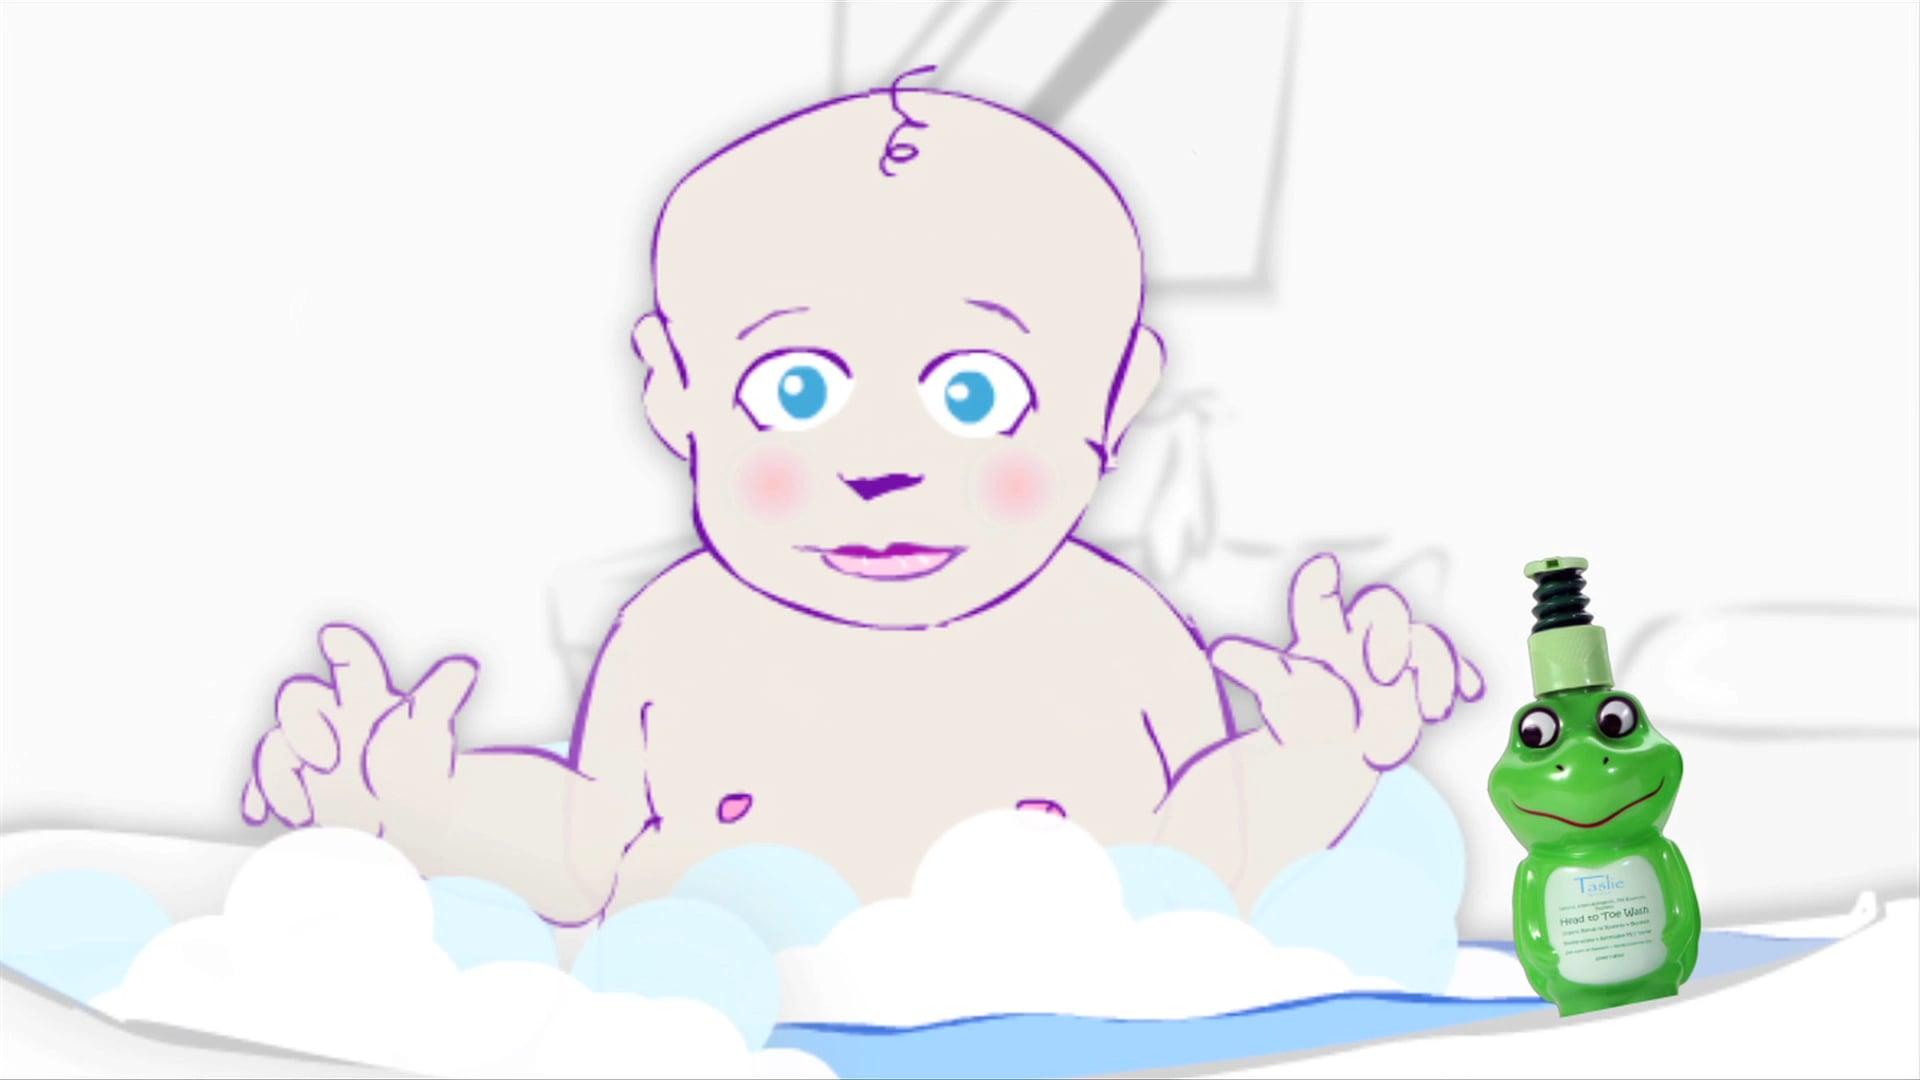 Taslie Skincare Animation